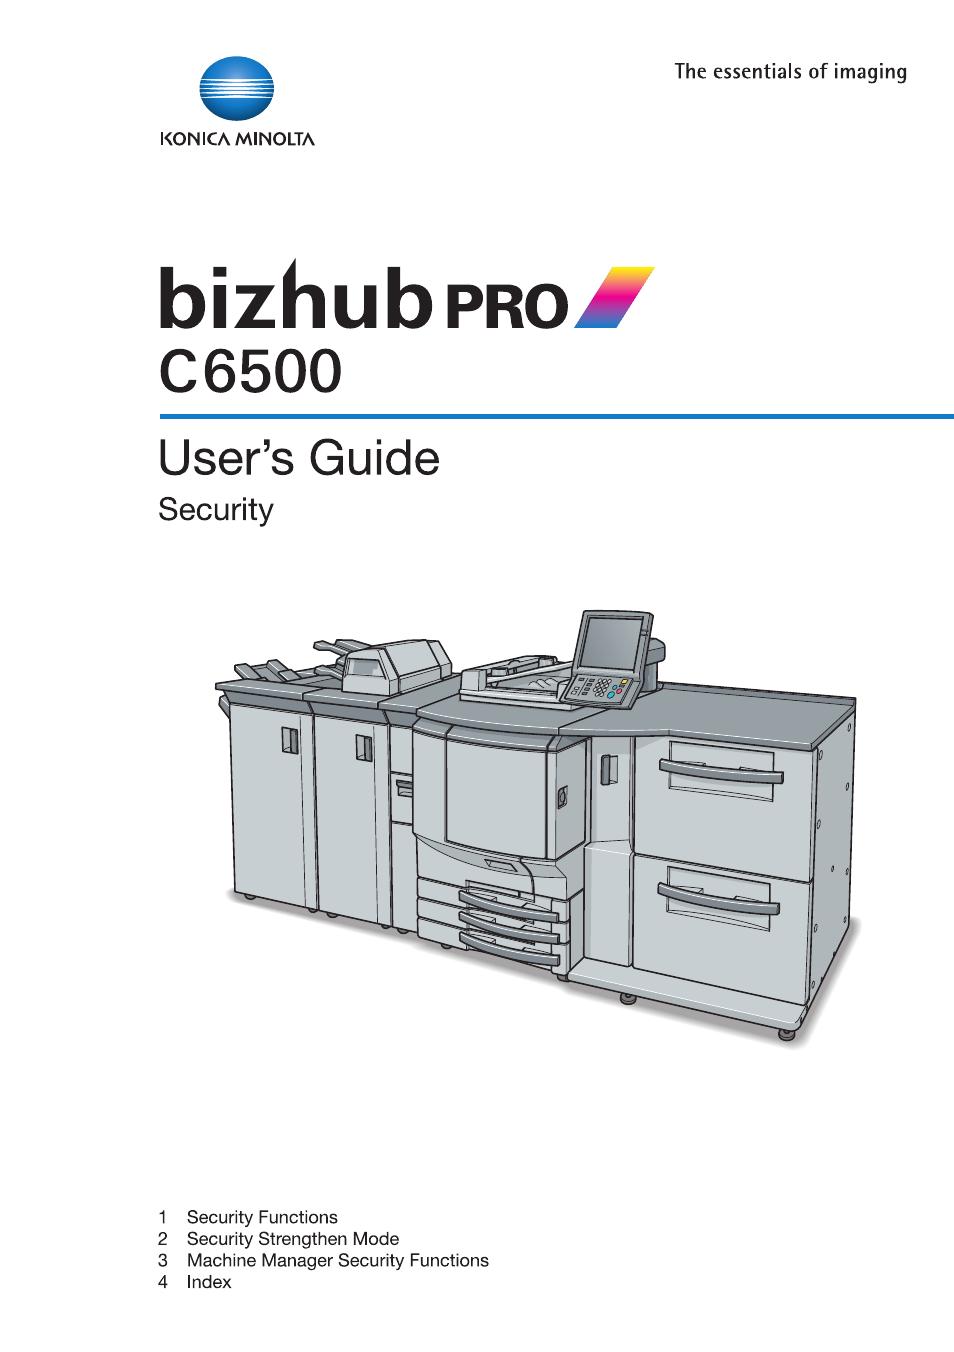 konica minolta bizhub pro c6500 user manual 32 pages rh manualsdir com Konica Minolta Bizhub C450 Konica Minolta Bizhub C550